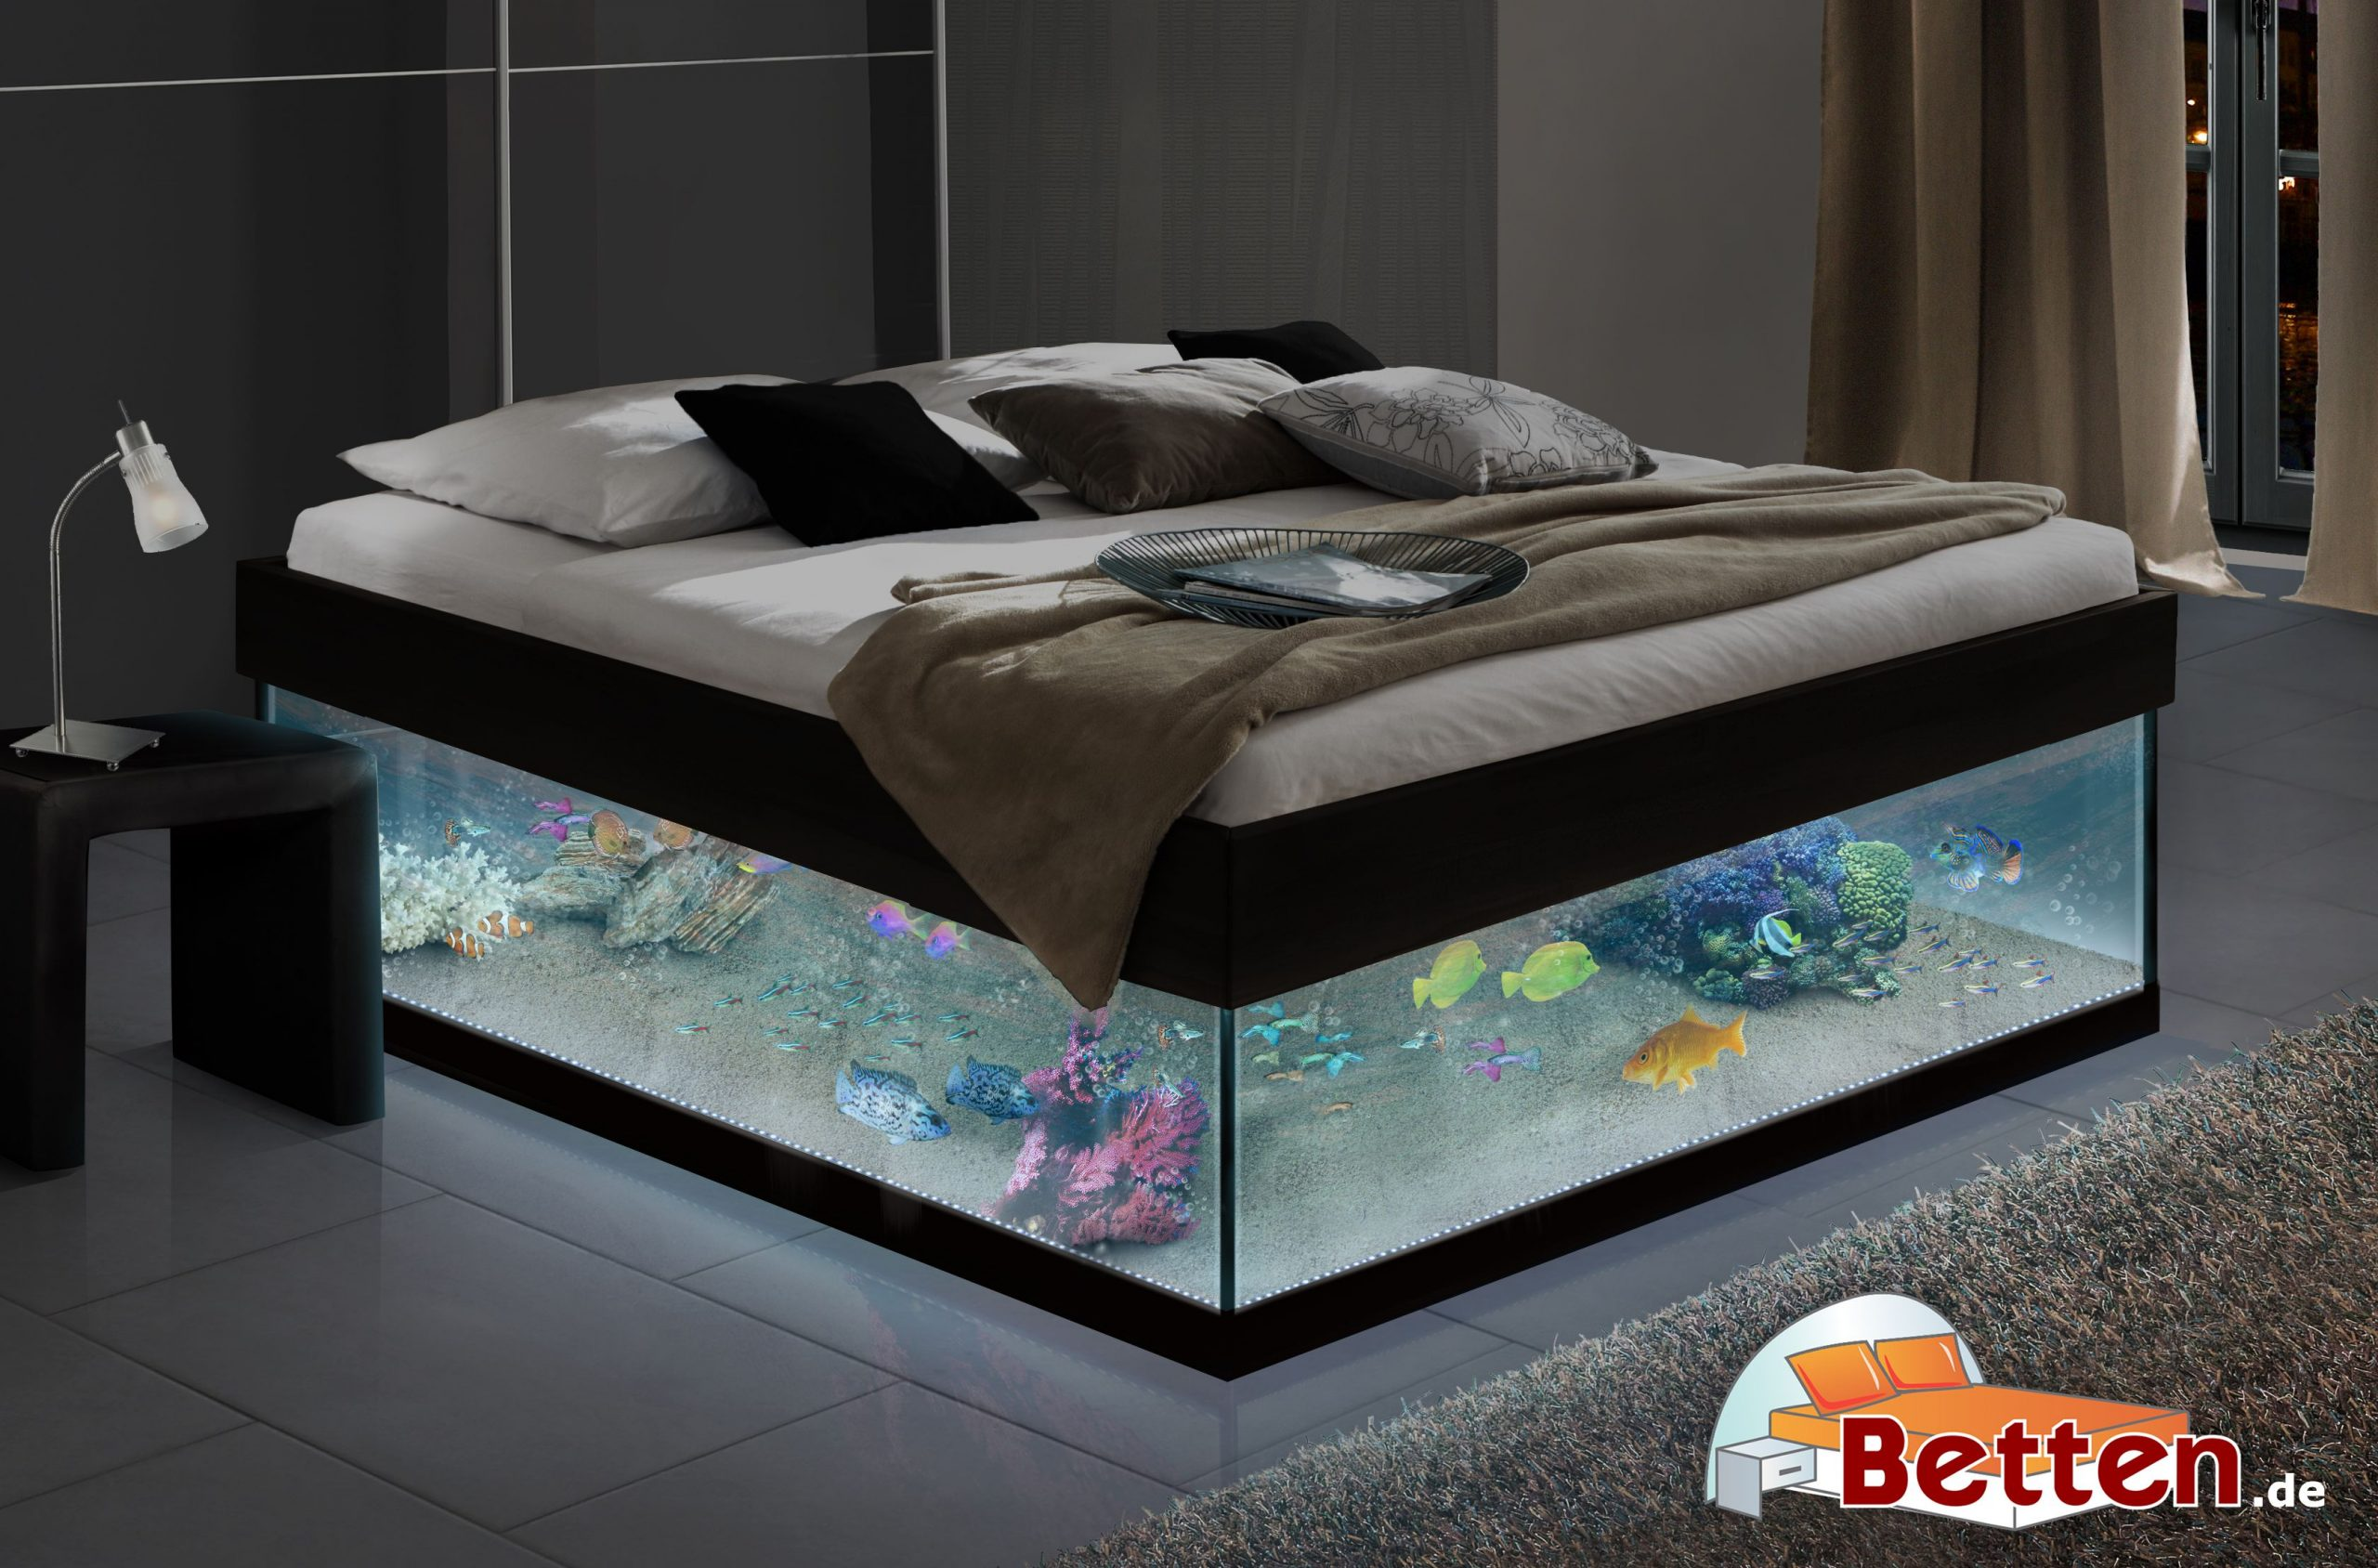 Full Size of Leuchtendes Aquariumbett Bettende Home Decor Deckenlampen Wohnzimmer Modern Billerbeck Betten Deckenlampe Esstisch Makler Baden Stellenangebote Württemberg Bett Betten De